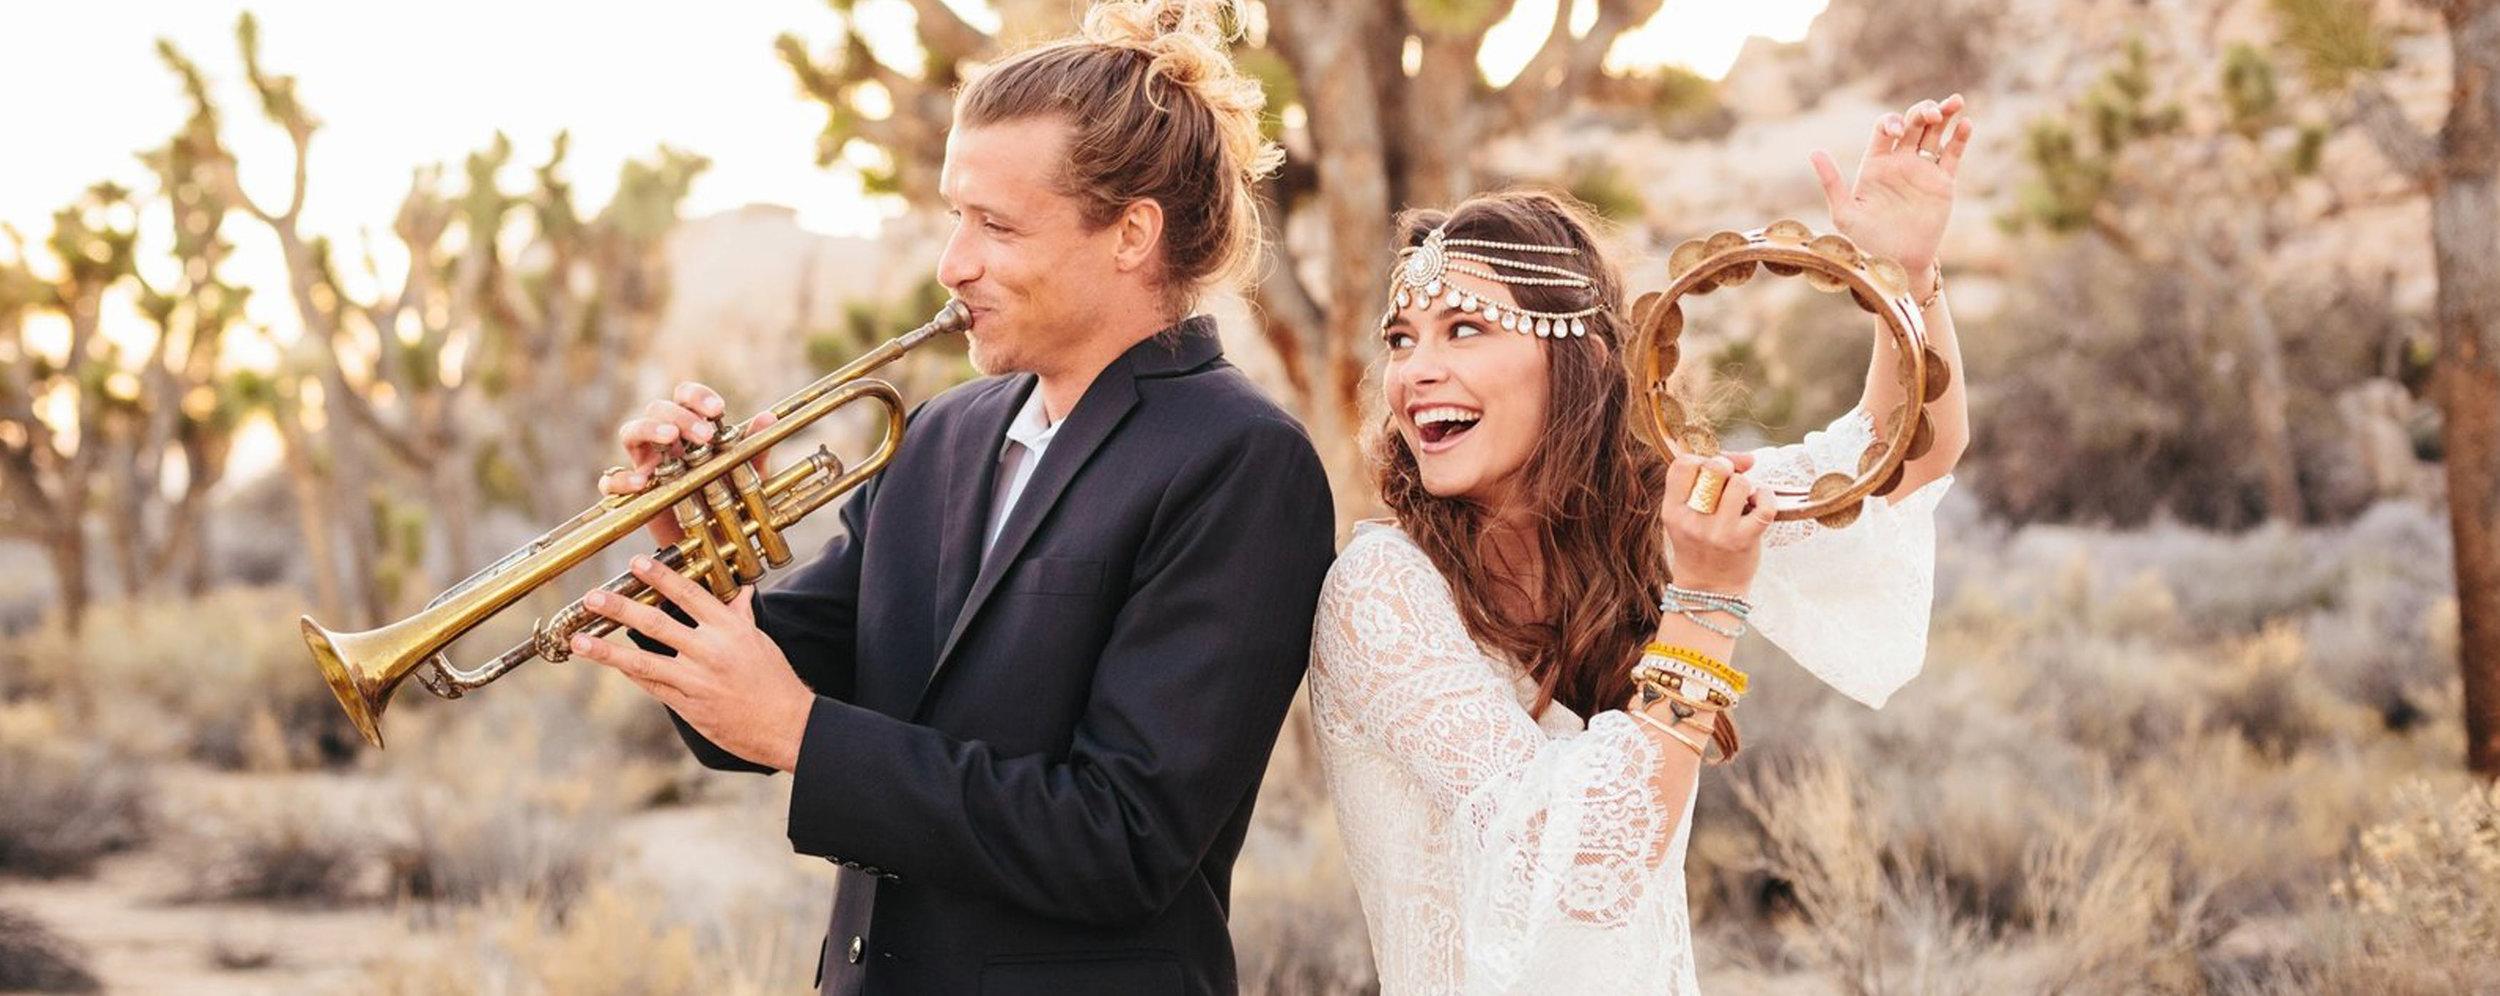 casaplutonia-wedding.jpg